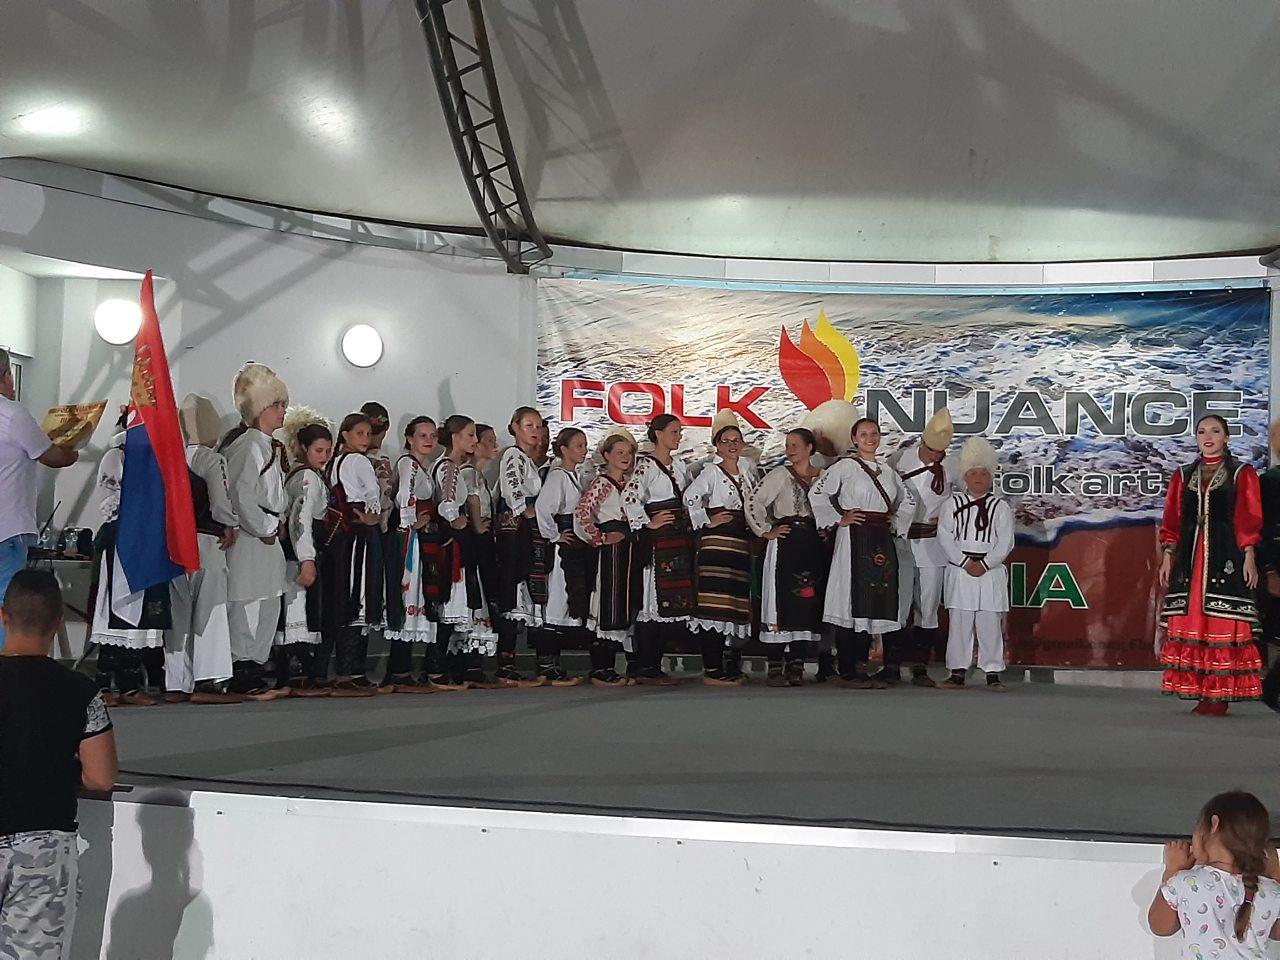 Нови господари Црног мора – 1. Дечији фолклорни ансамбл Центра за културу